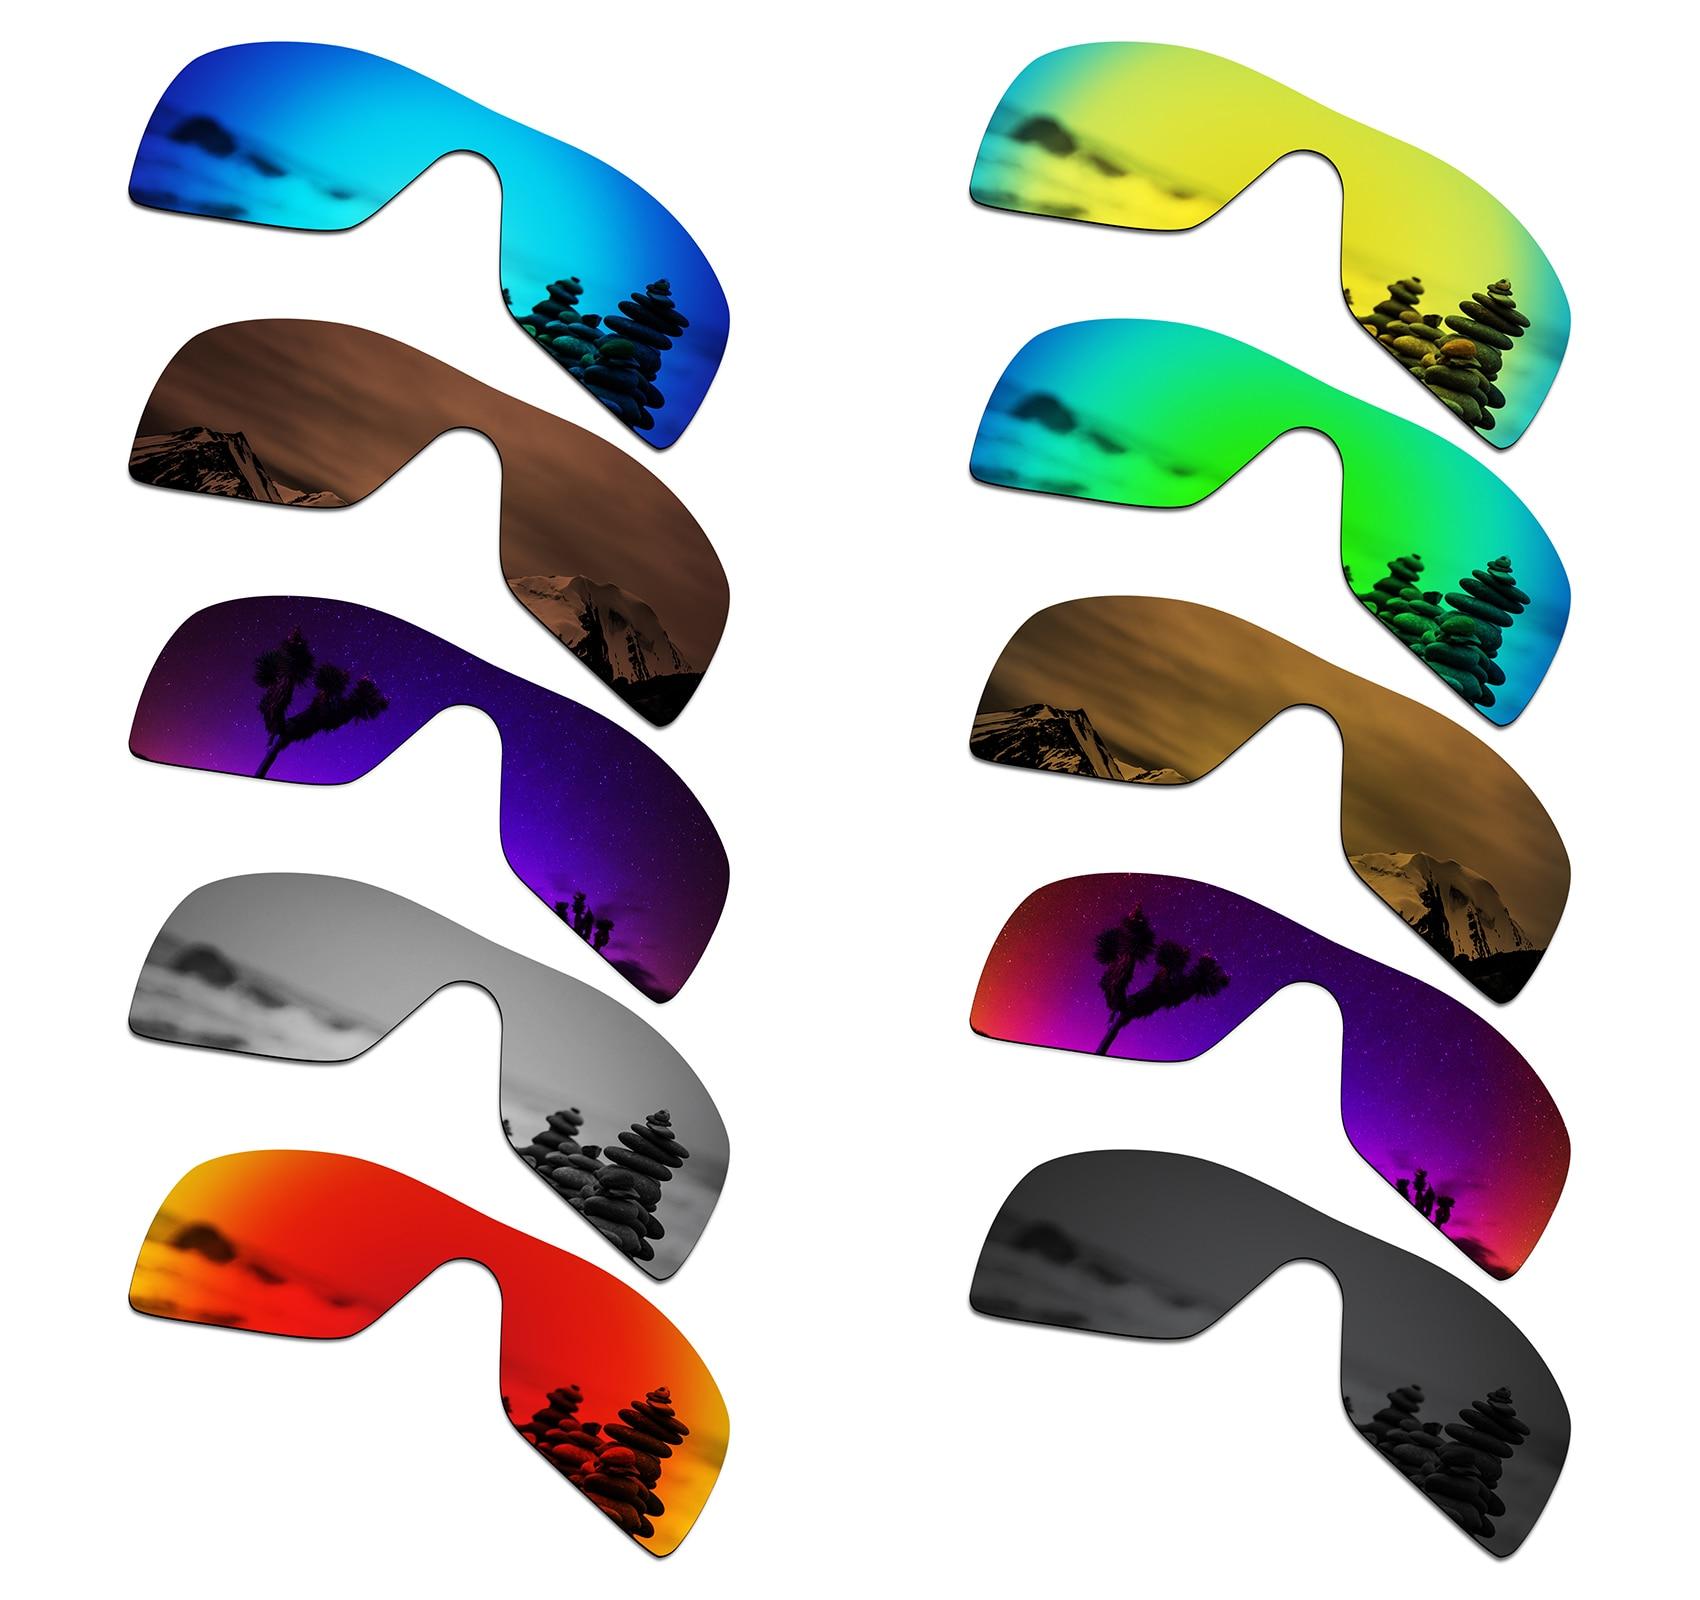 SmartVLT Polarized Replacement Lenses For Oakley Batwolf Sunglasses - Multiple Options